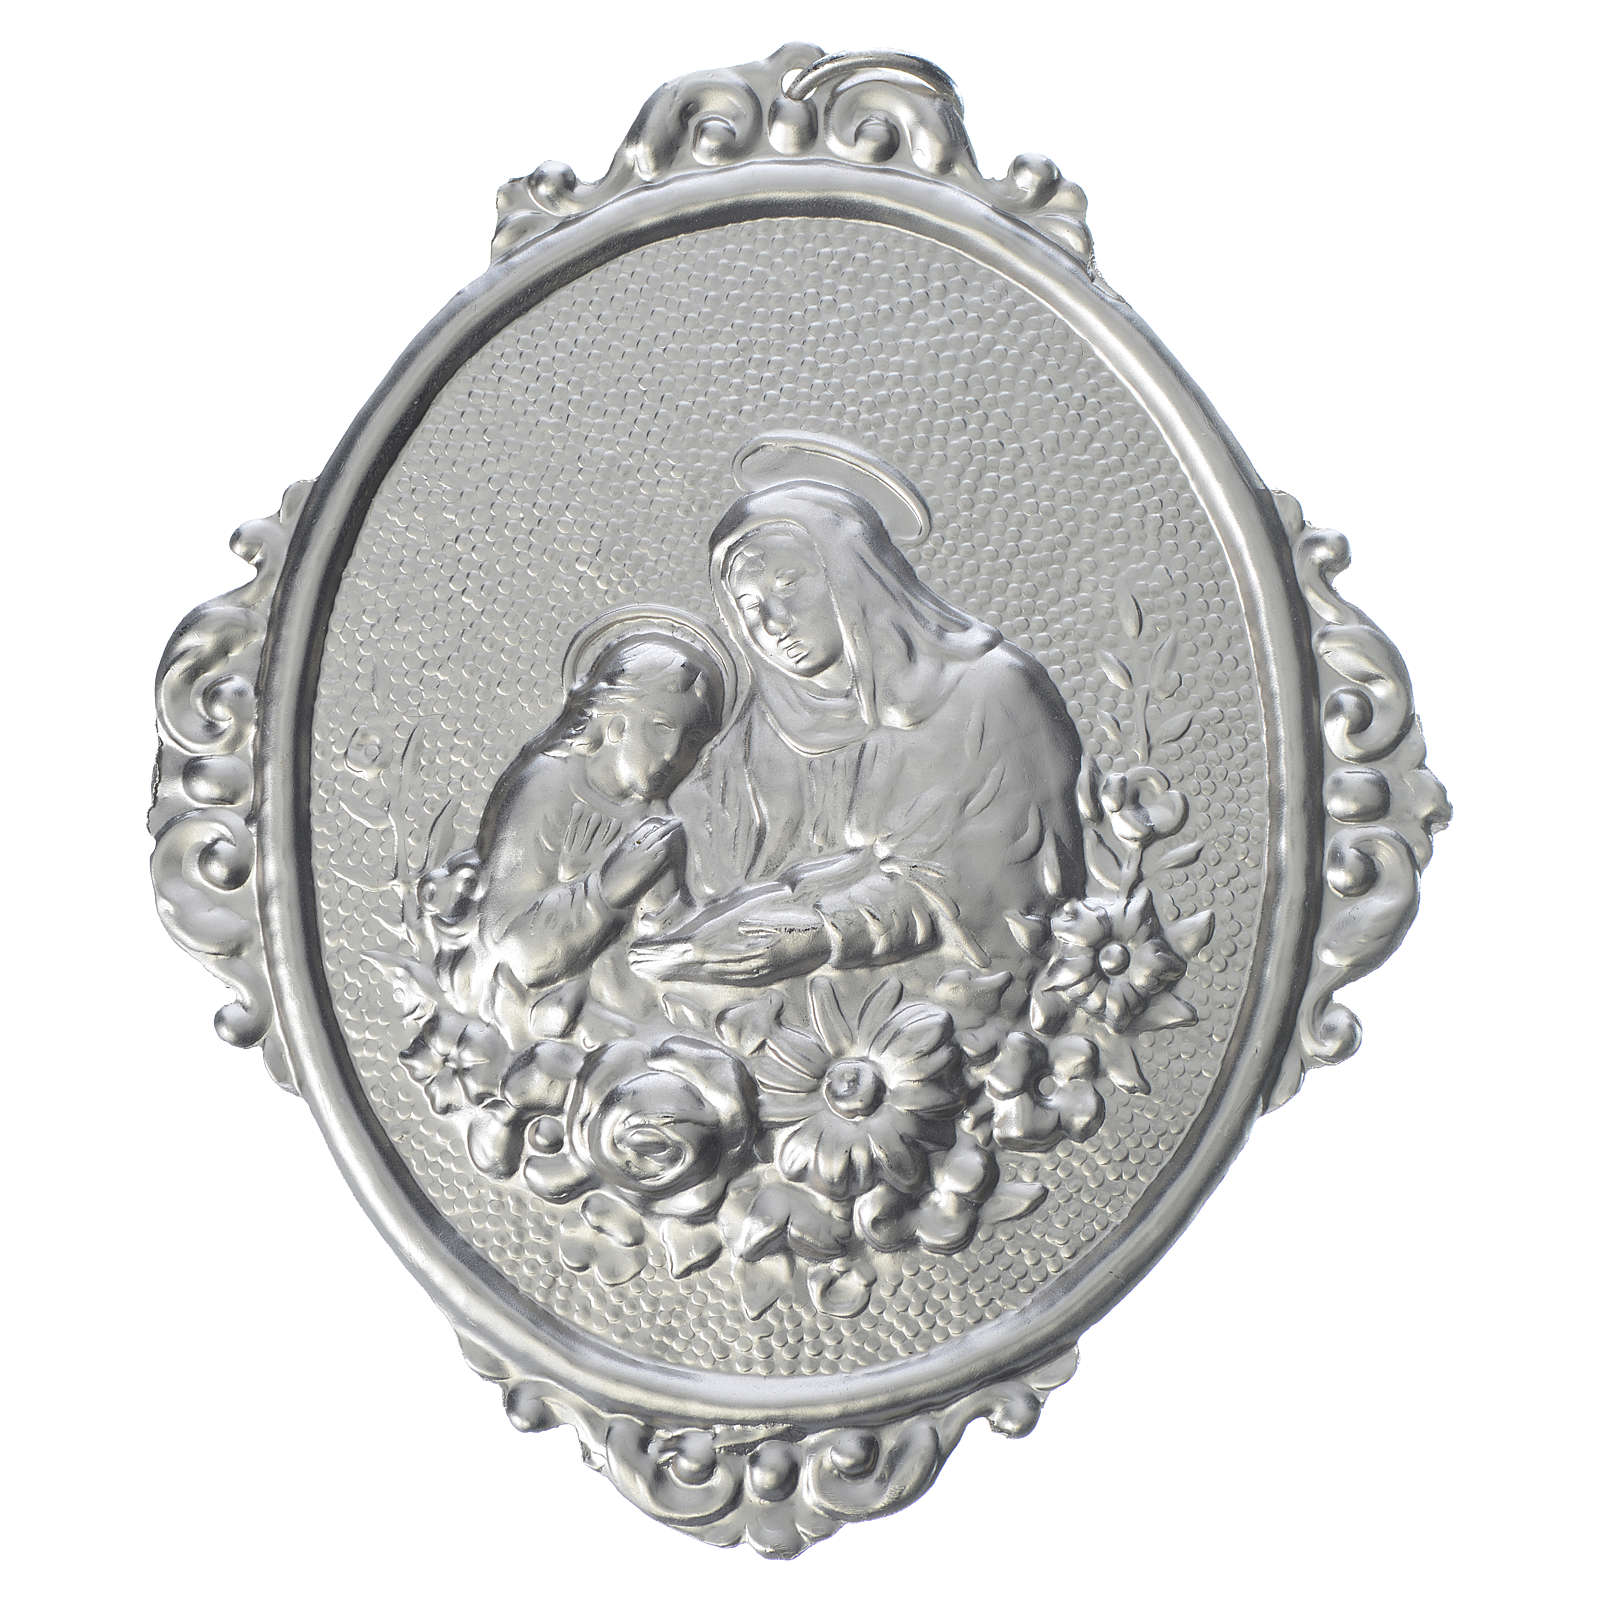 Medalla cofradía Santa Ana con flores 3